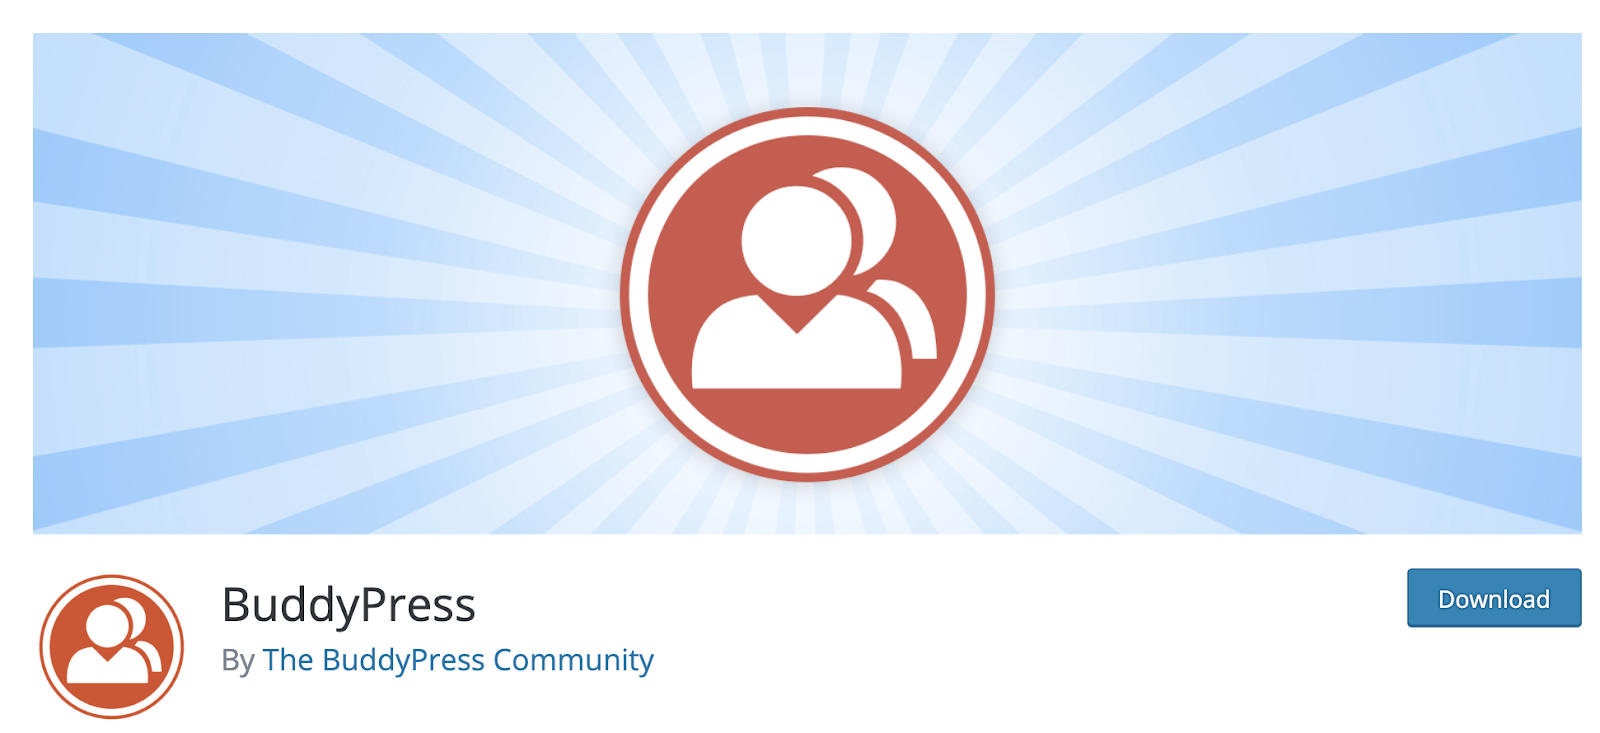 product page for the WordPress plugin buddypress